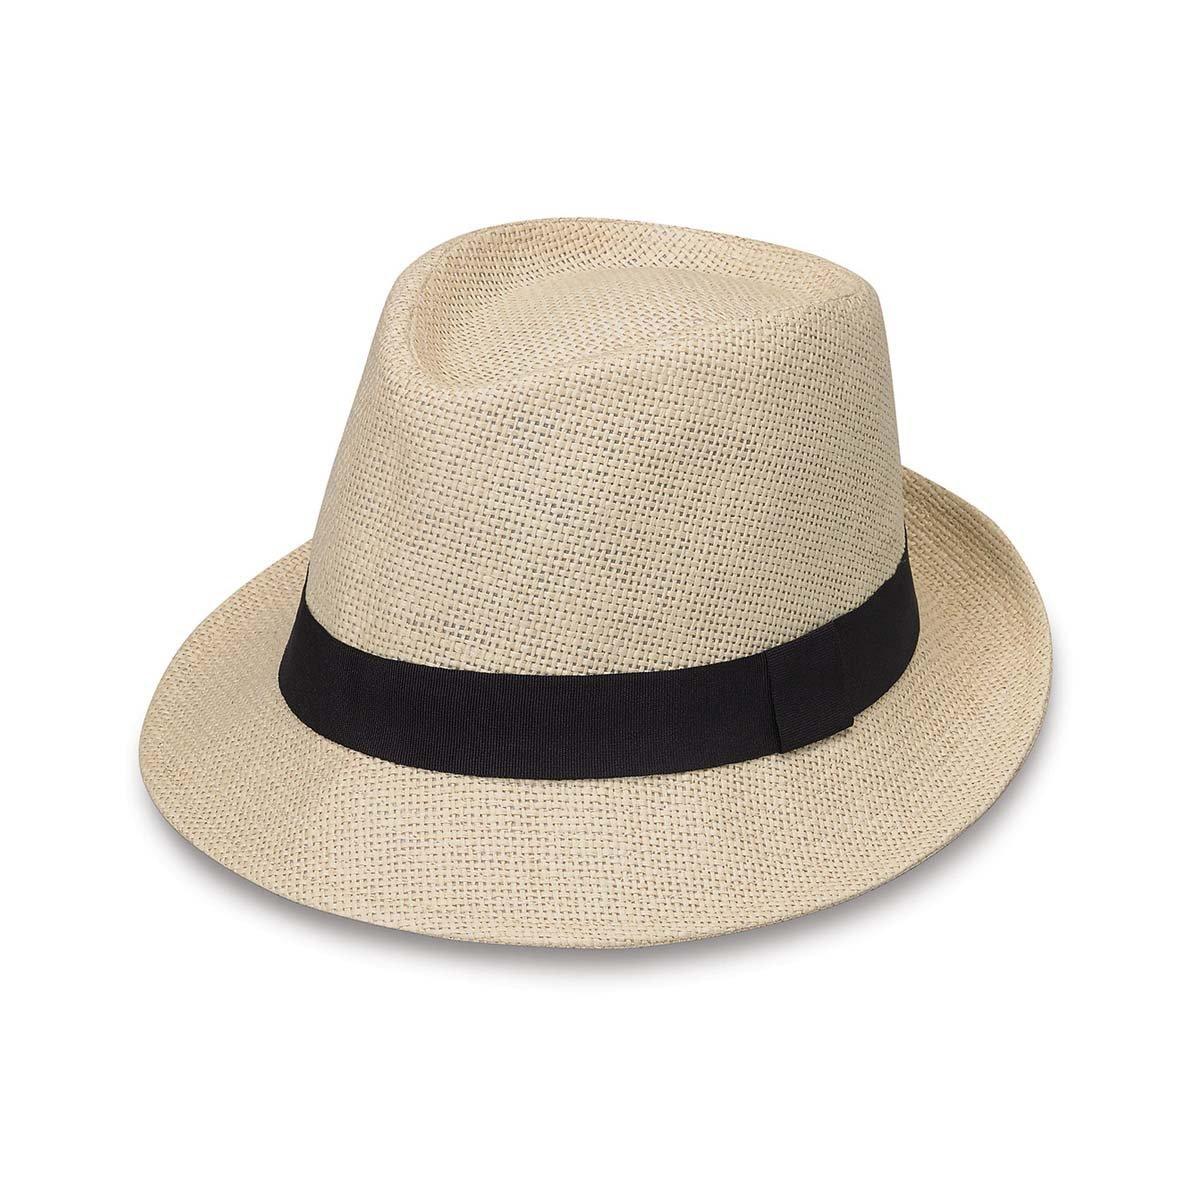 Wallaroo Hat Company: WALLAROO SEASON CLOSEOUT SALE | Milled